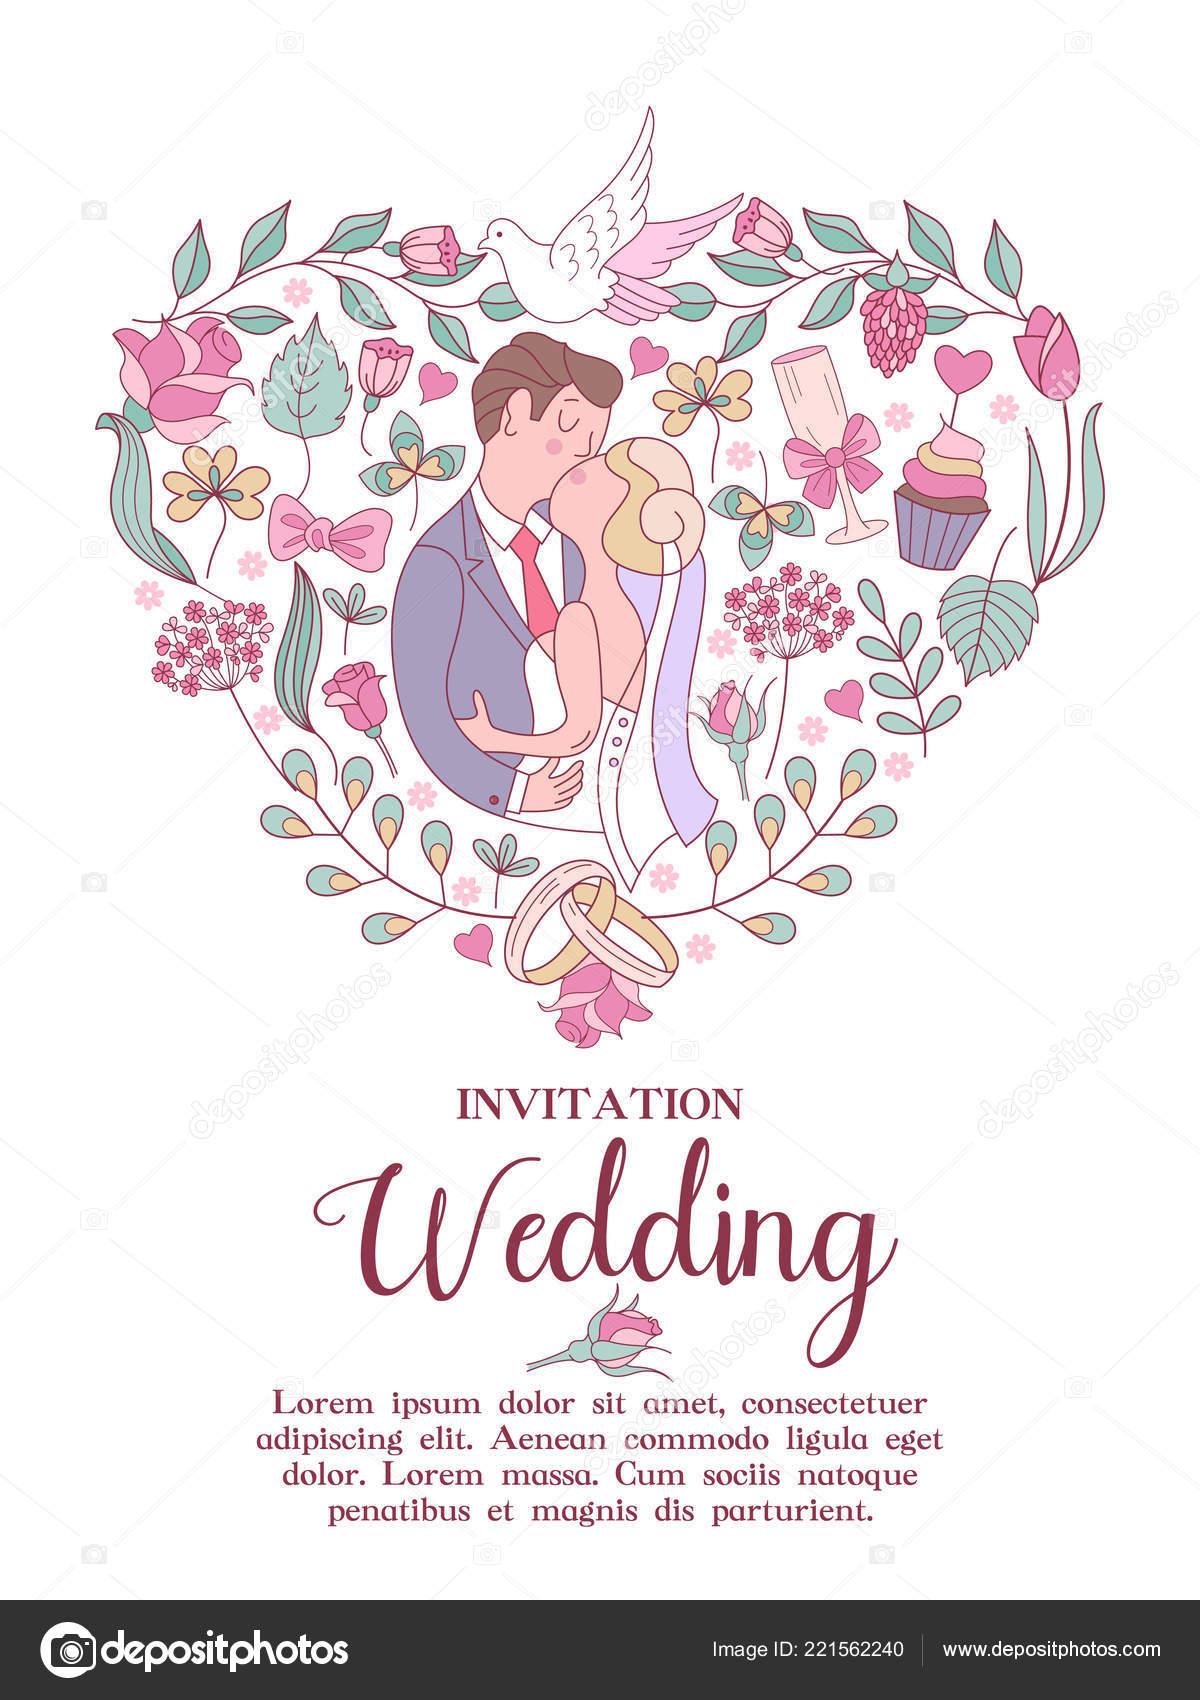 Wedding Invitation Beautiful Wedding Card Kiss Bride Groom Delicate